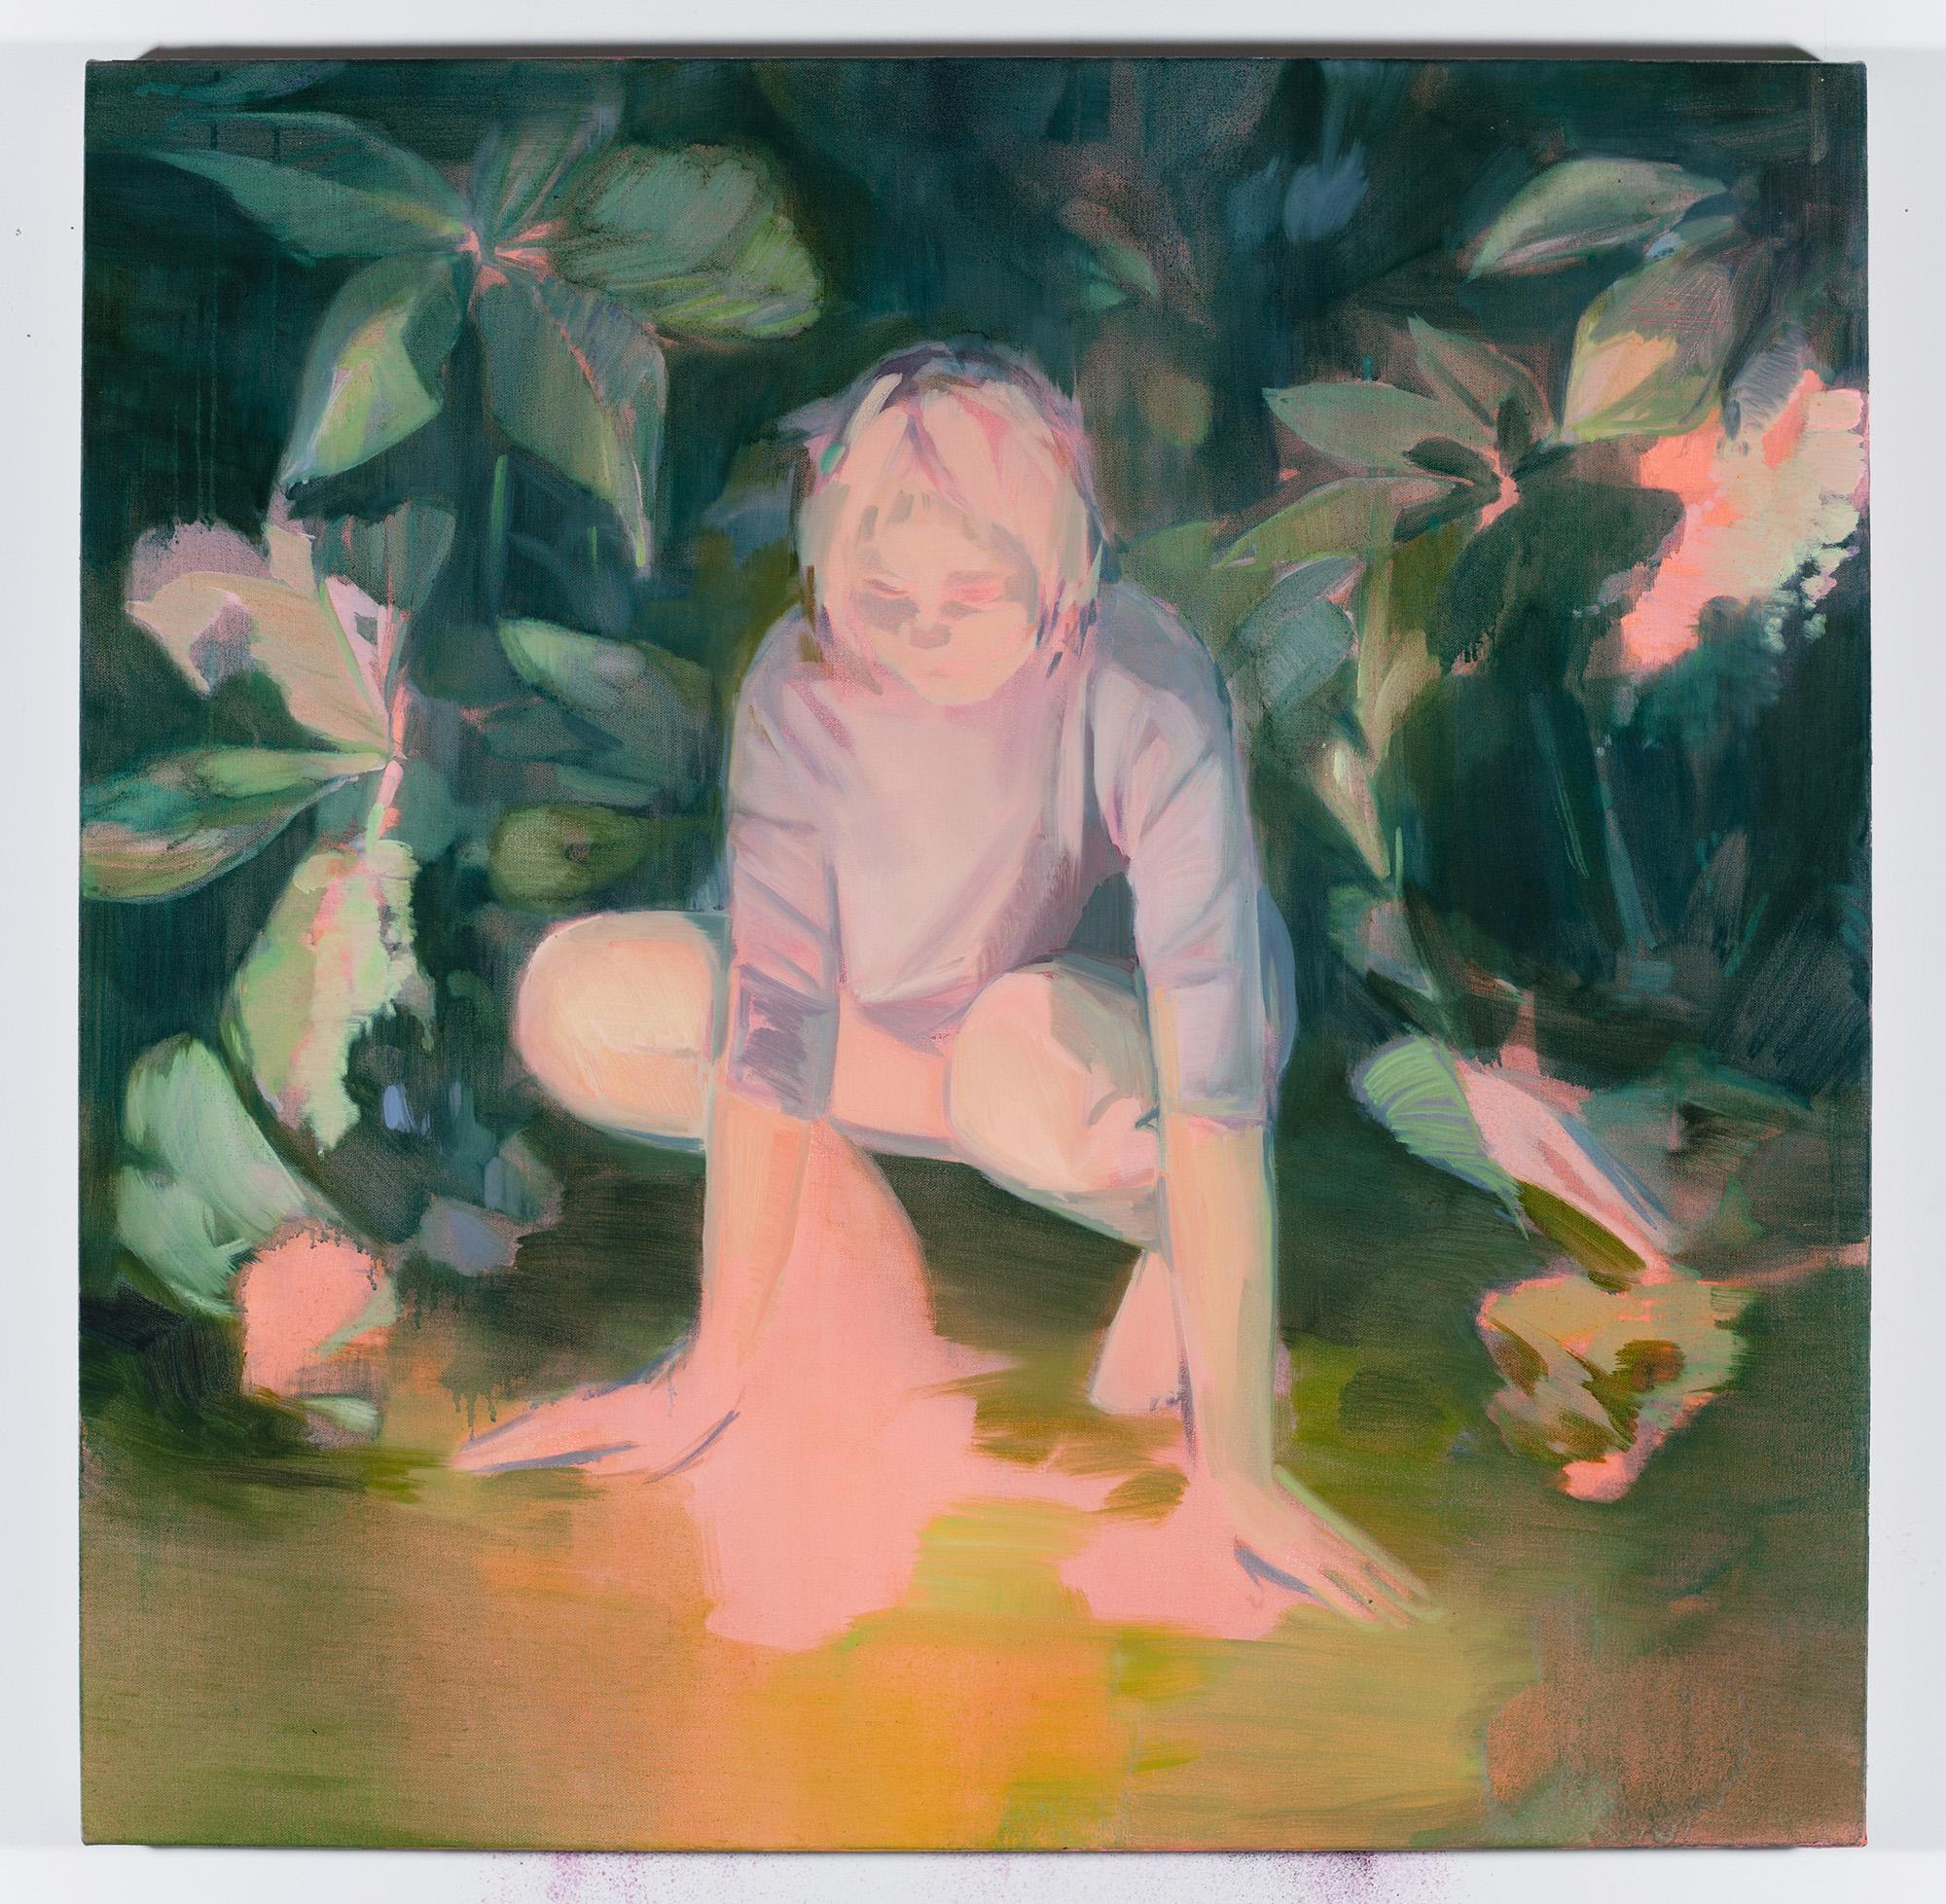 Corri-Lynn Tetz, Conjure , 2017, oil on canvas, 30x 30 inches